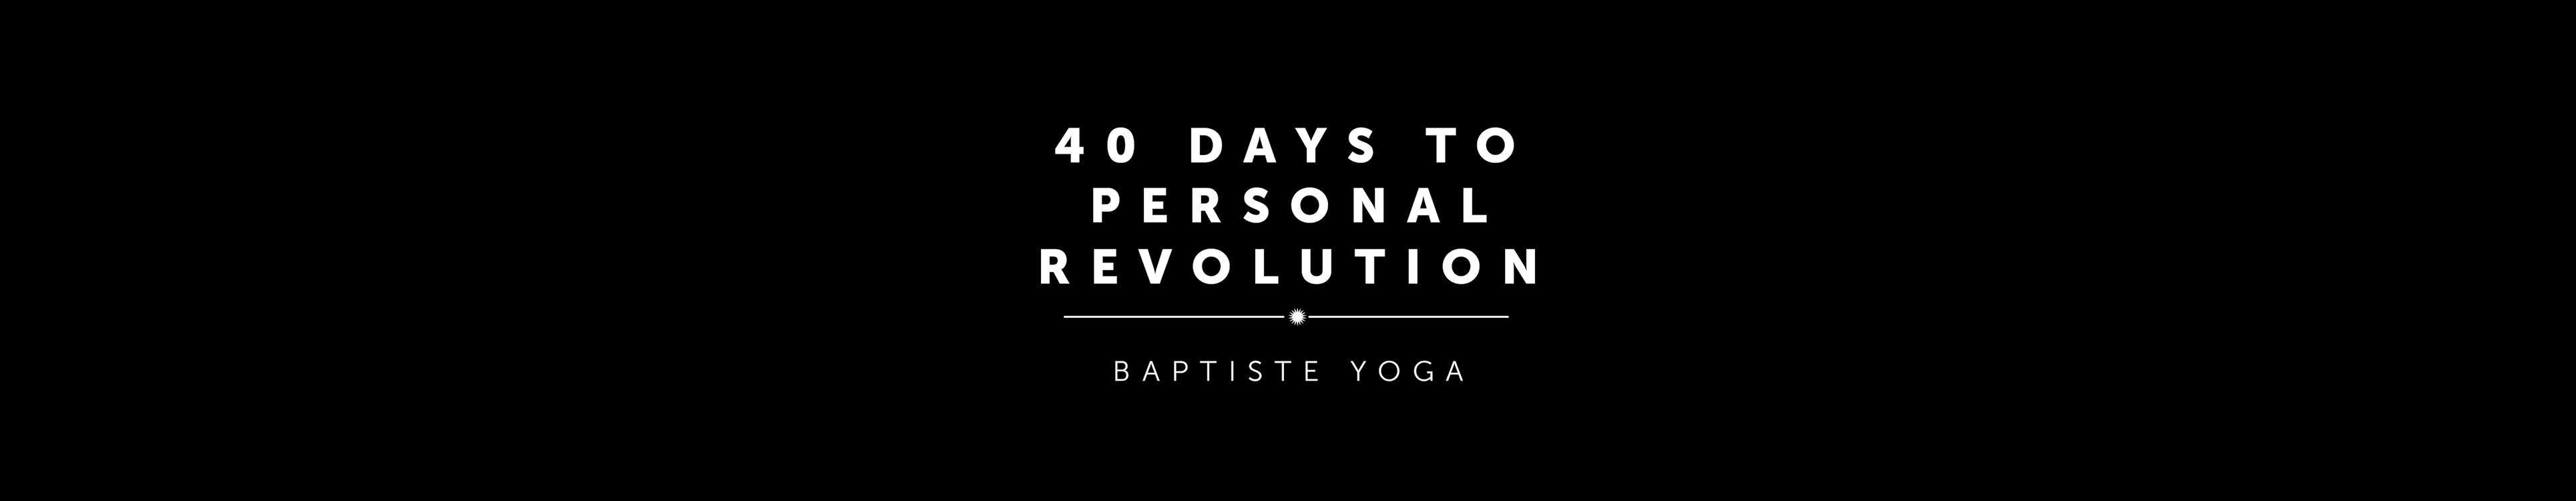 40 Days to Personal Revolution - Facilitator in Training